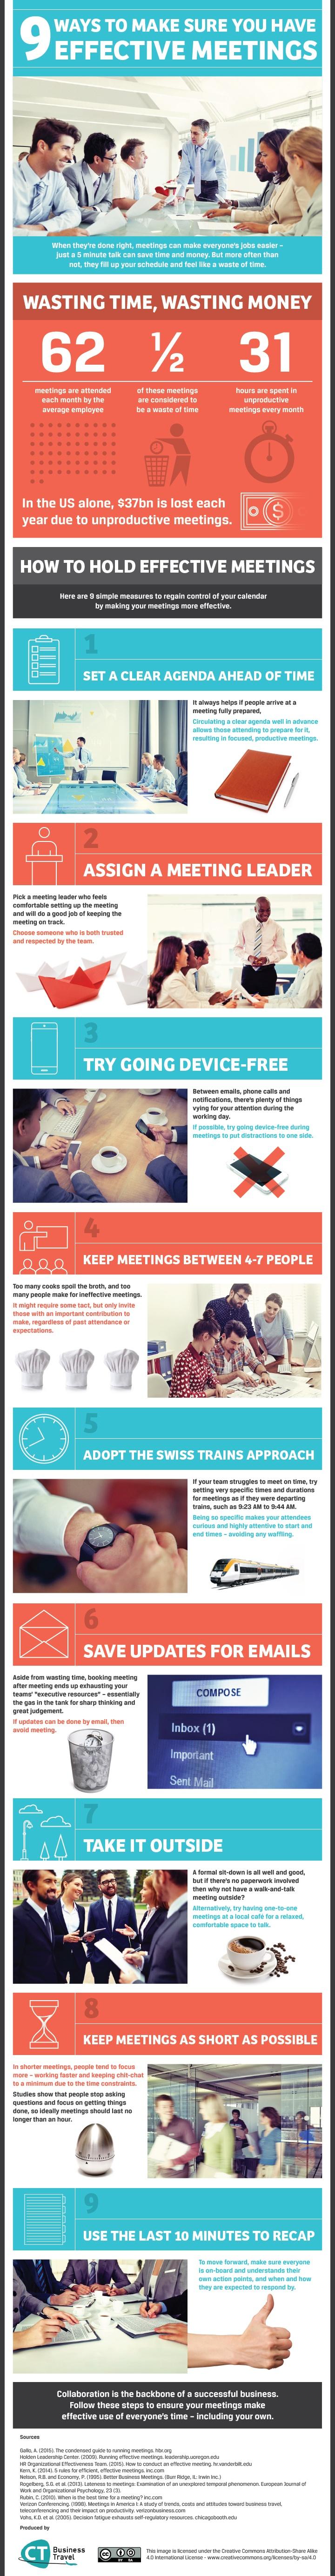 effective-meetings-infographic.jpg